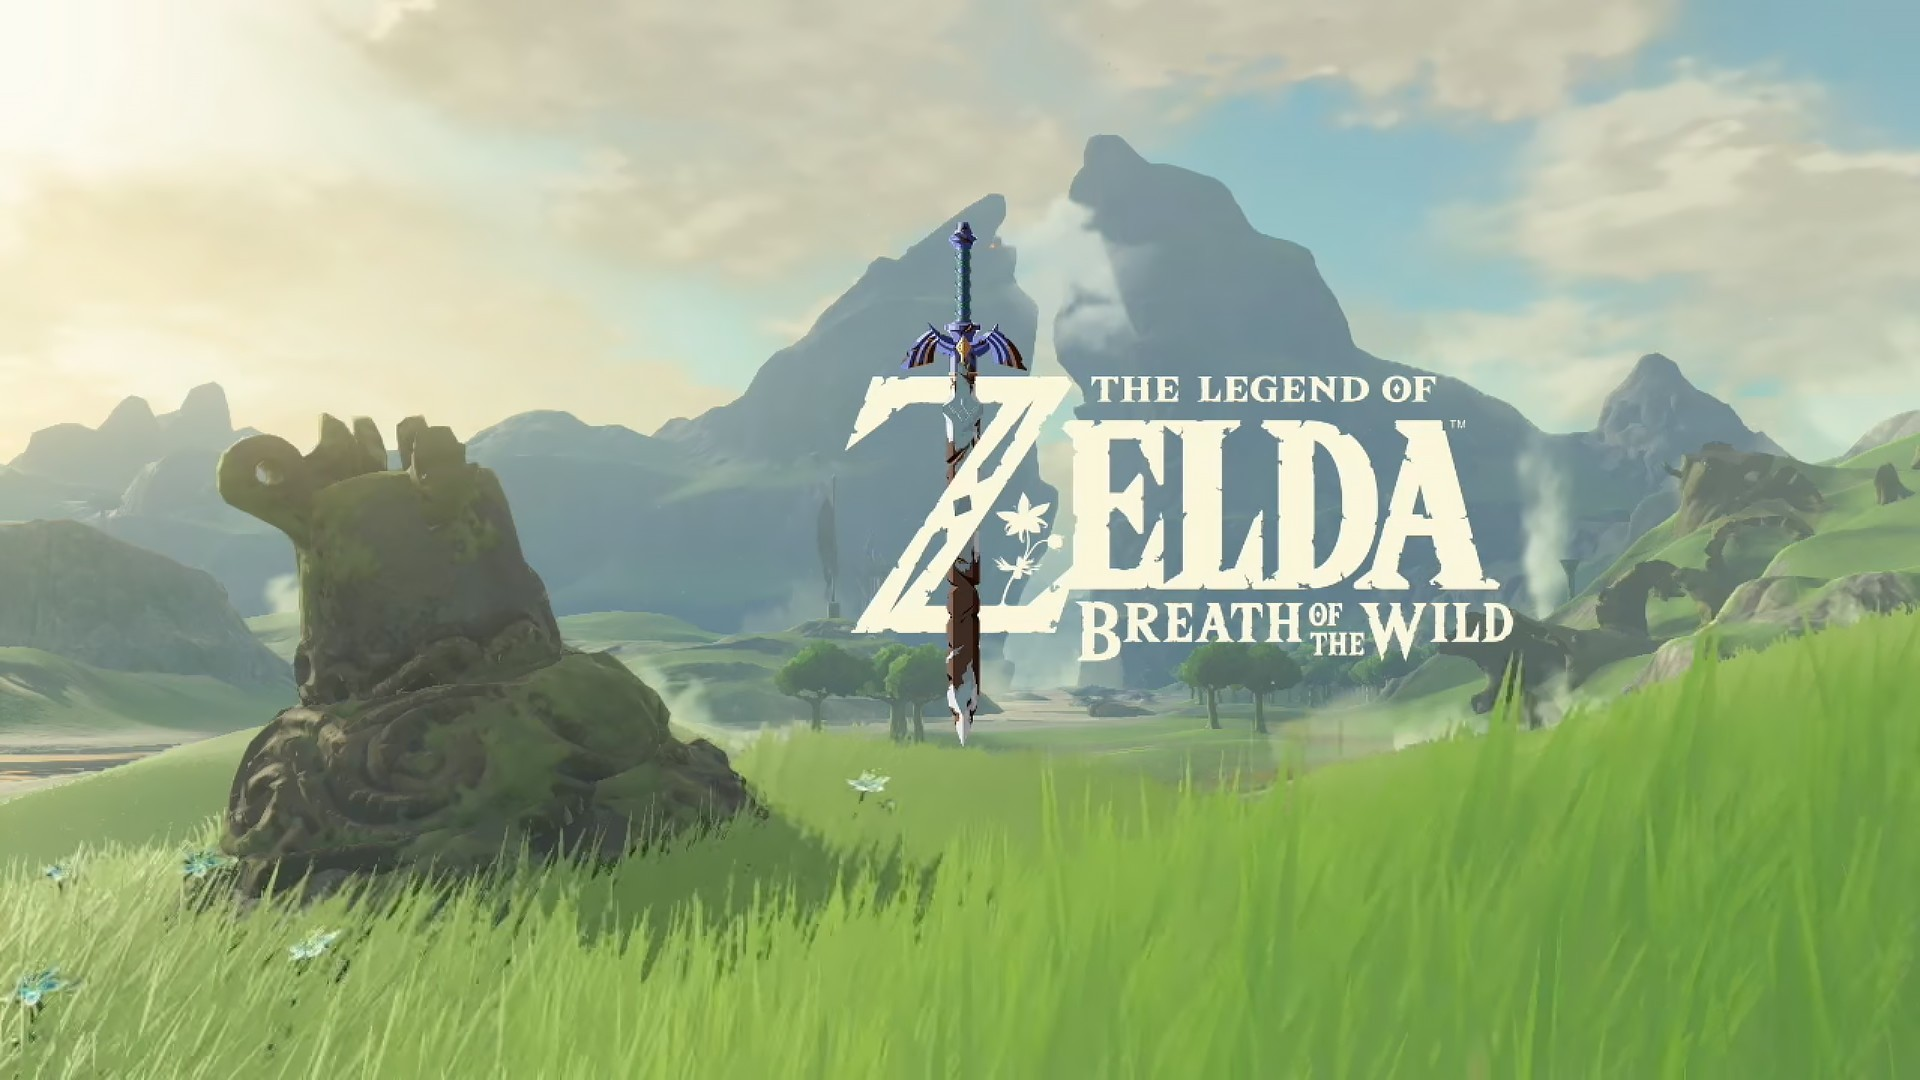 Zelda Breath Of The Wild Wallpaper Hd: The Legend Of Zelda: Breath Of The Wild HD Wallpaper